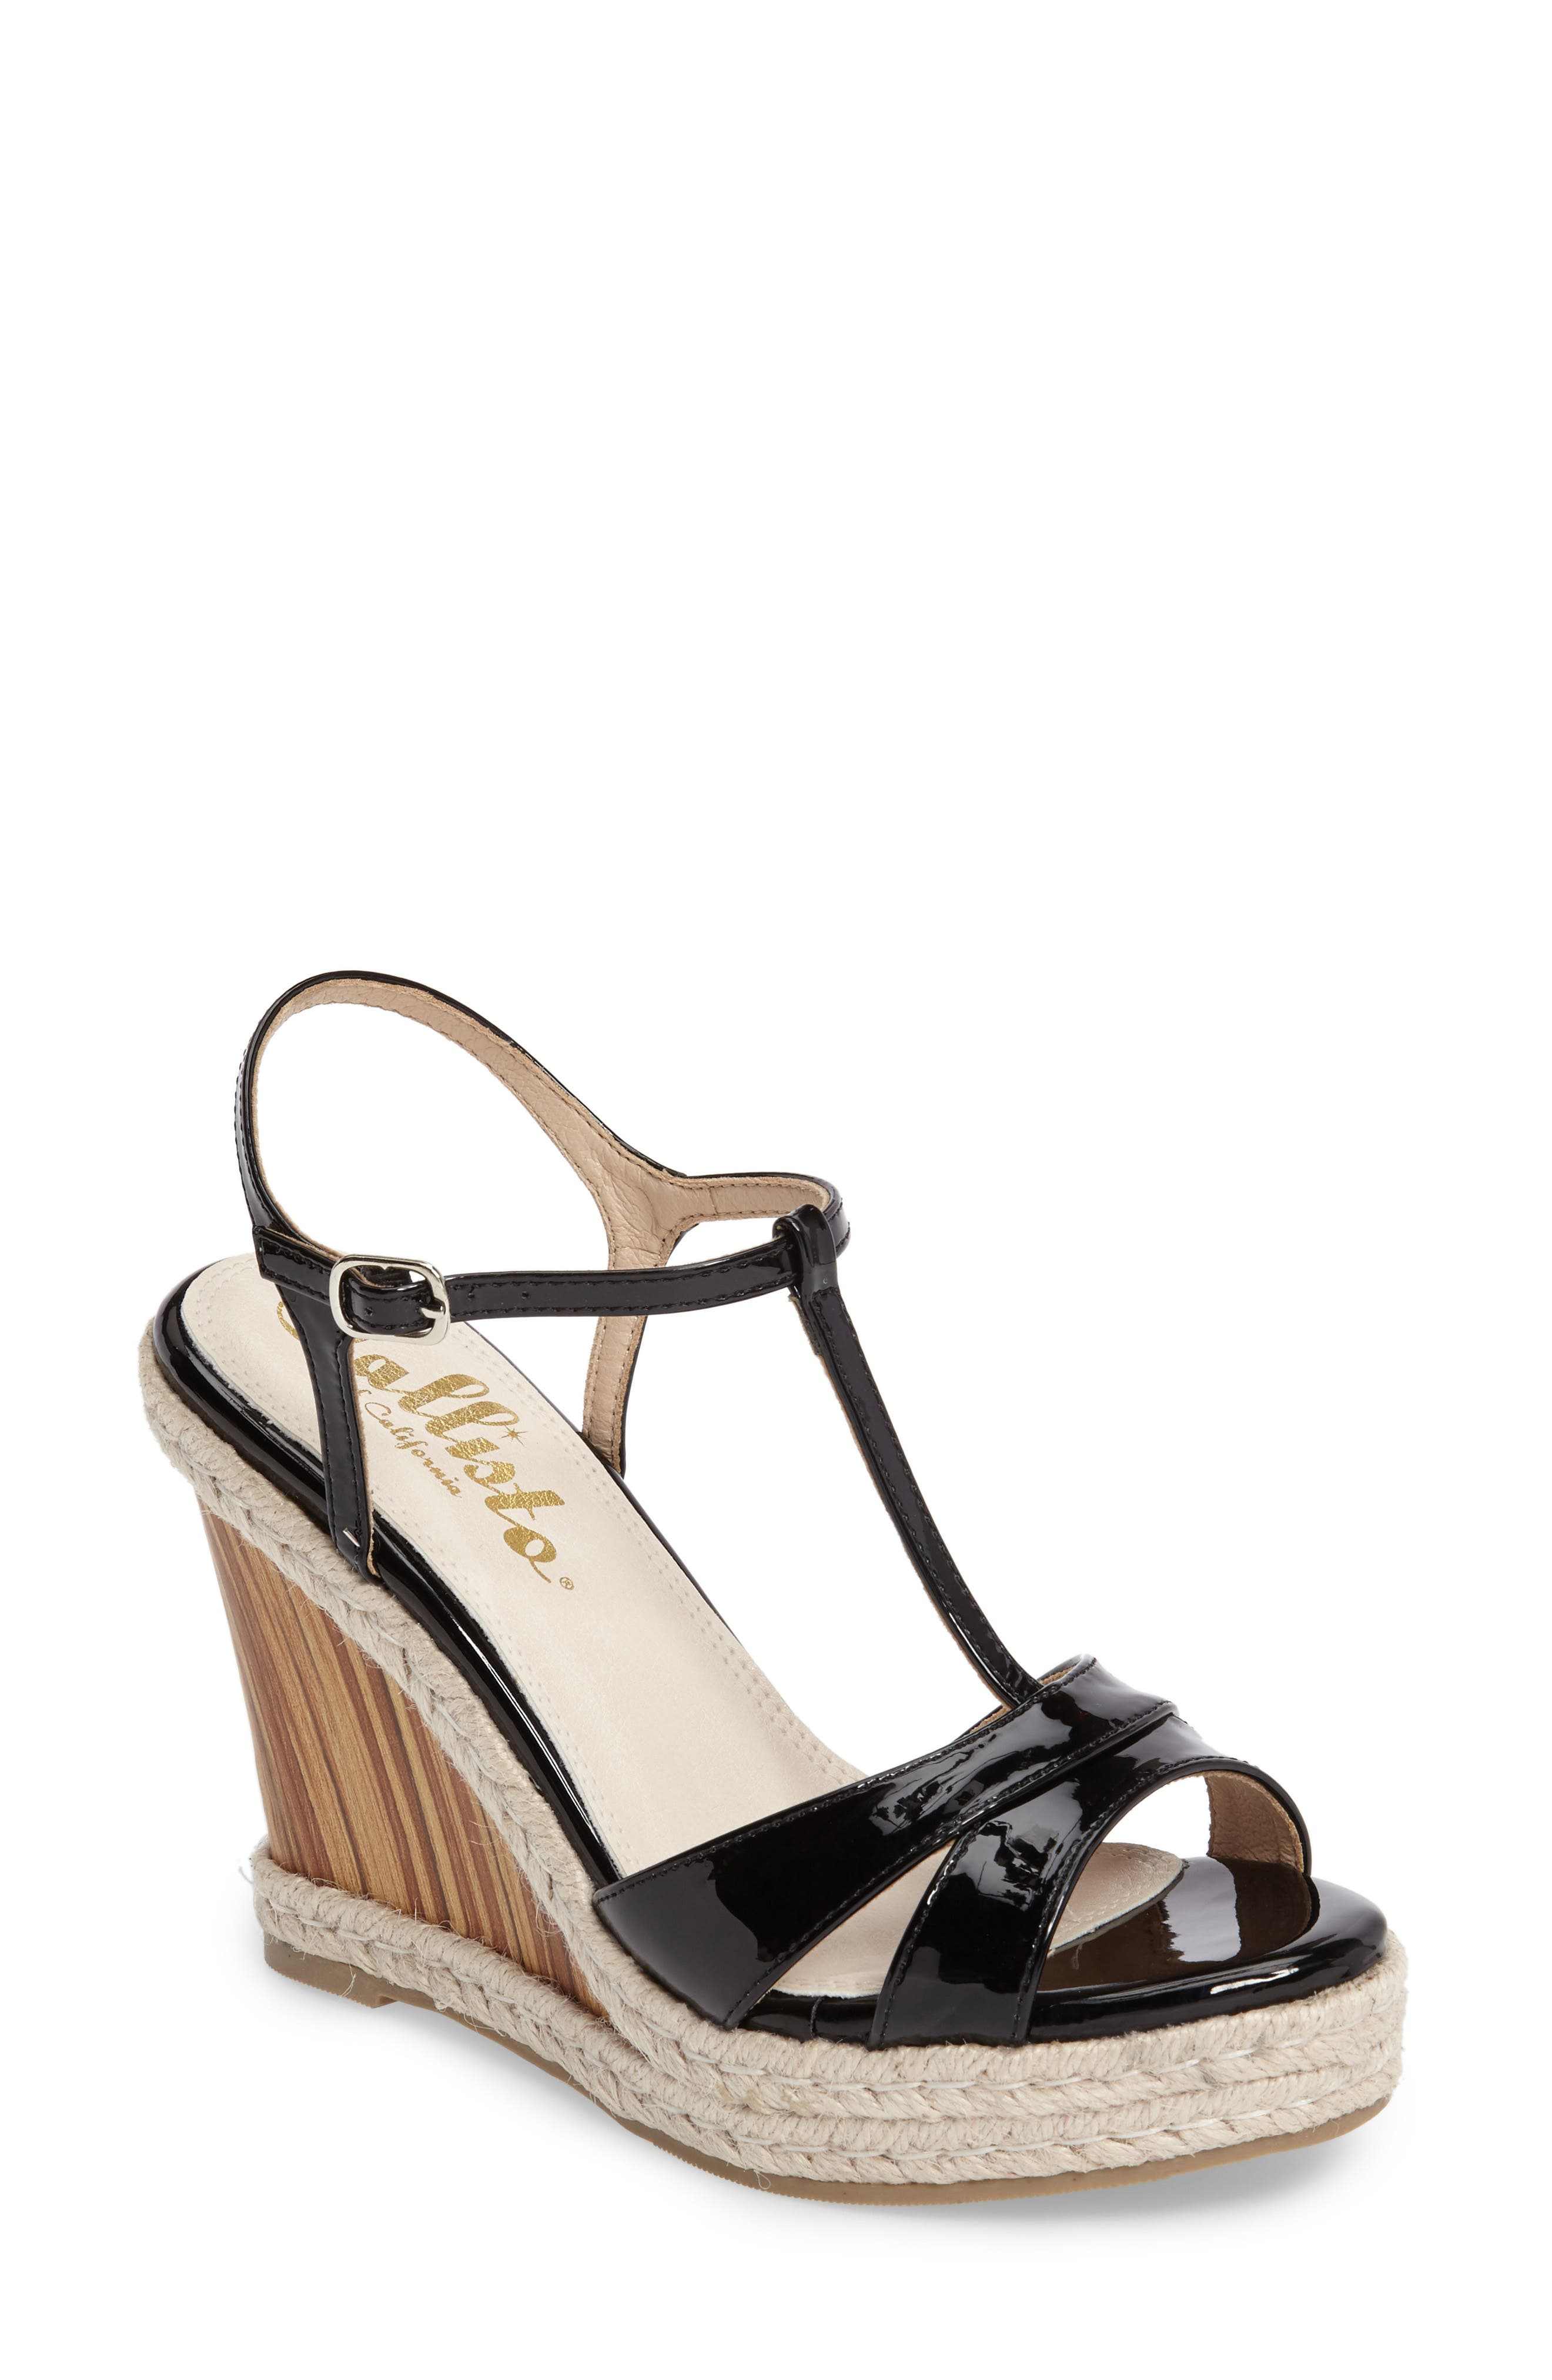 Alternate Image 1 Selected - Callisto Alinna T-Strap Wedge Sandal (Women)